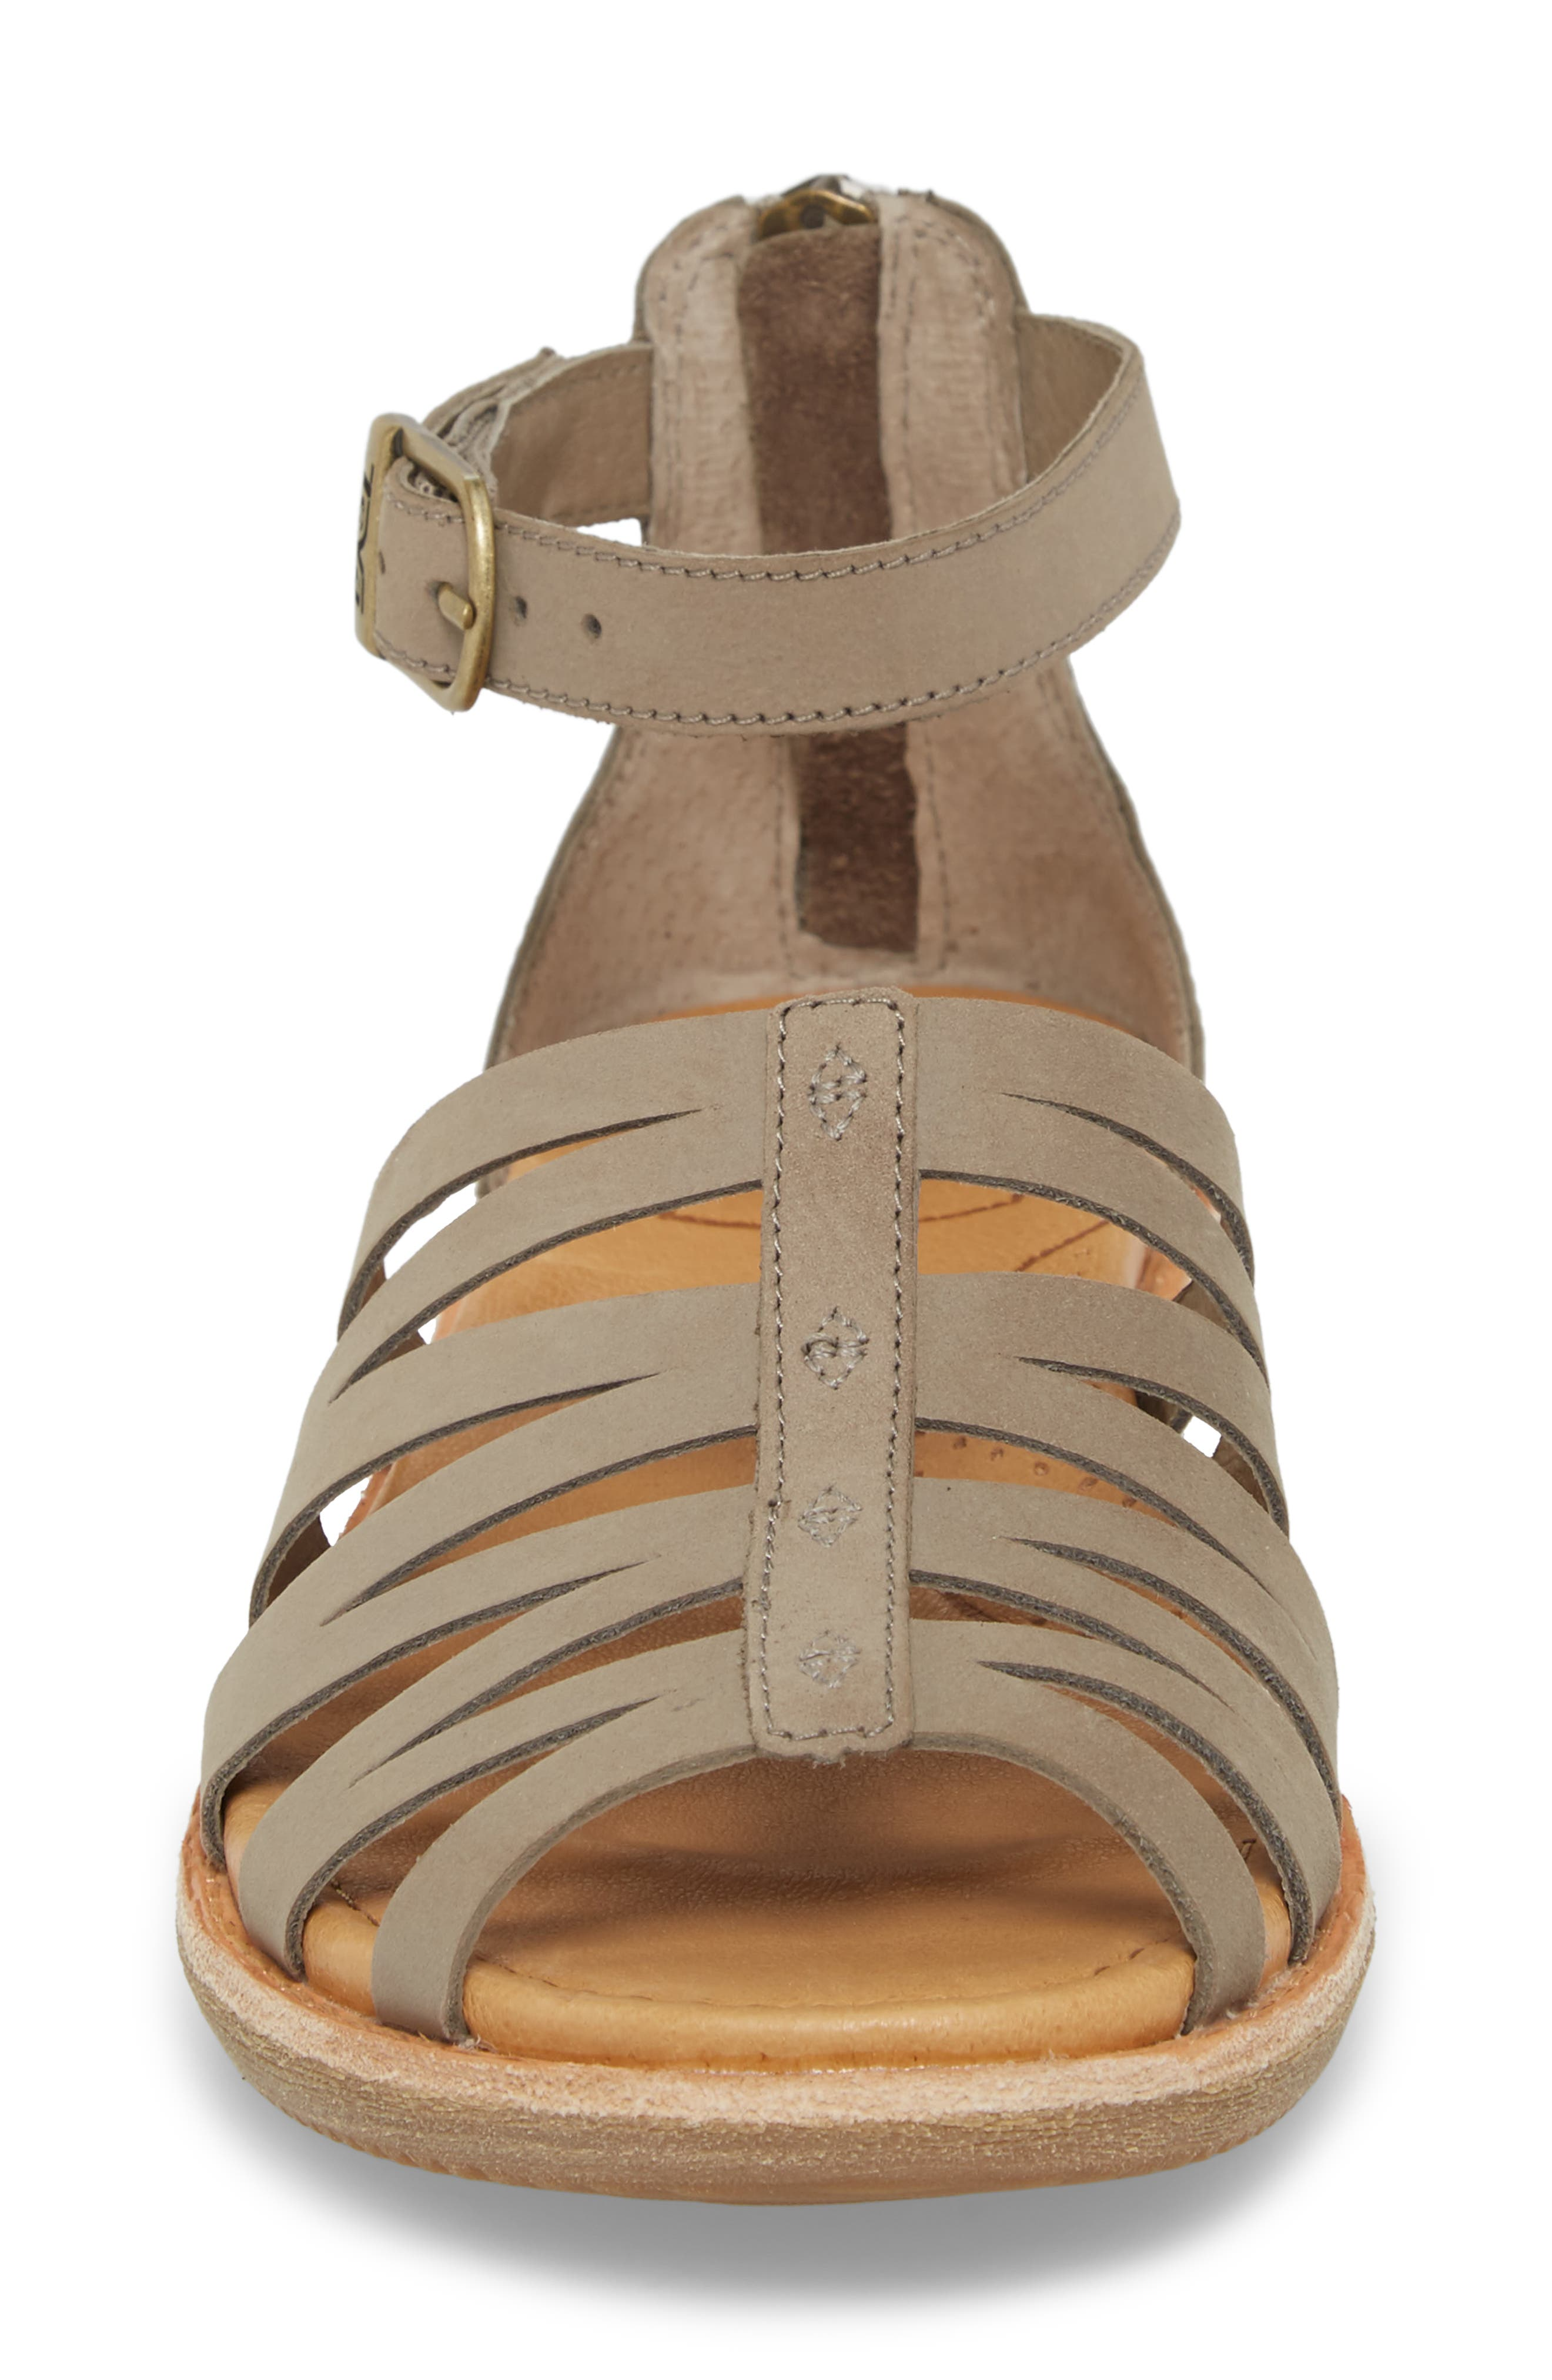 Encanta Sandal,                             Alternate thumbnail 4, color,                             Taupe Leather